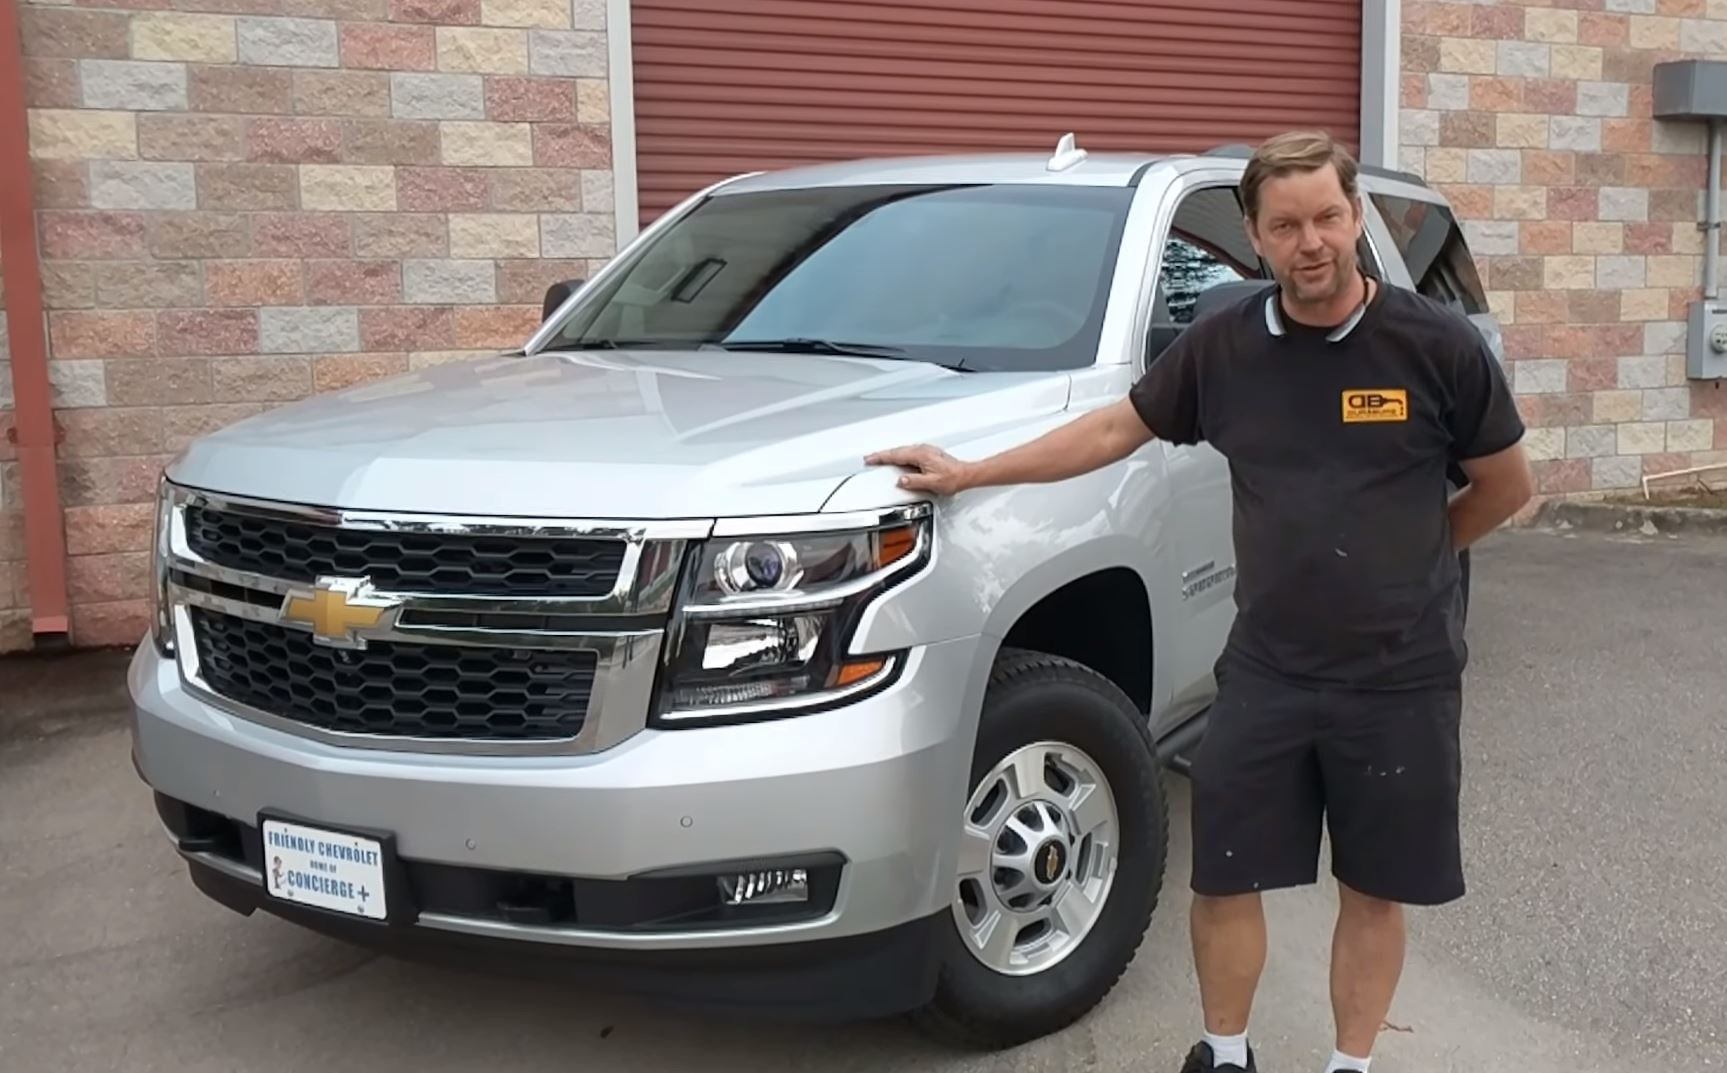 Florida Man Does God S Work Converting Chevrolet Suburbans